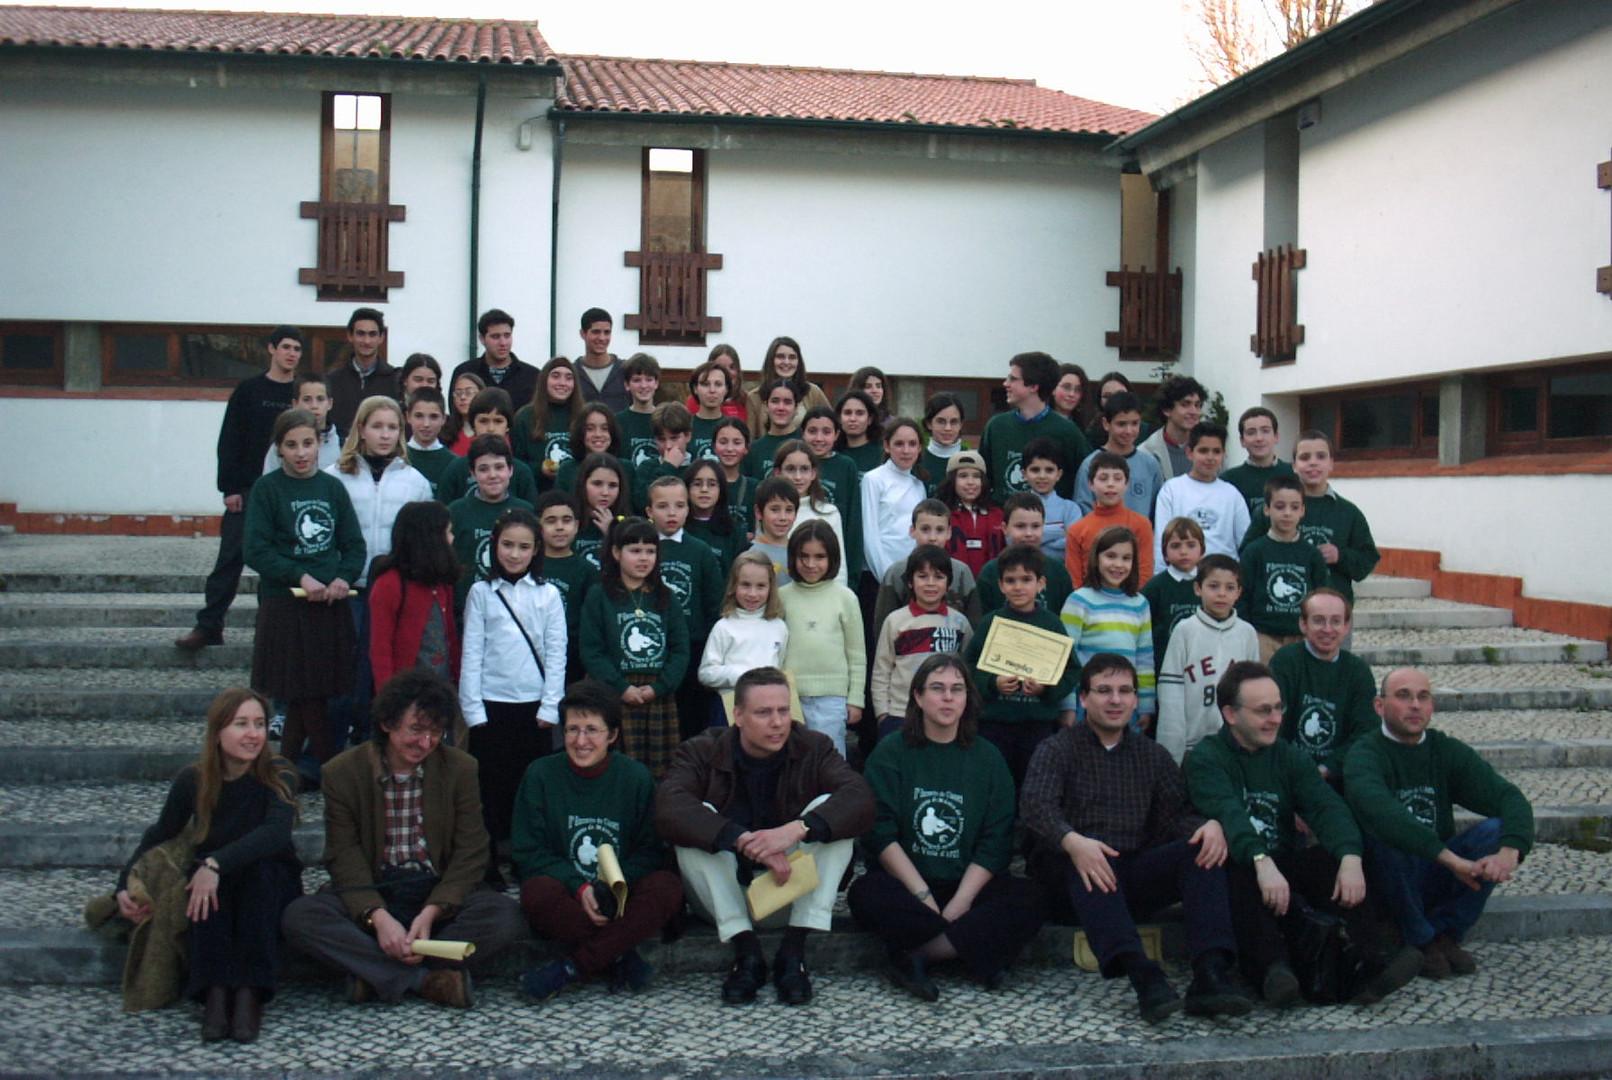 2003 2 encontro Aveiro_3_.JPG